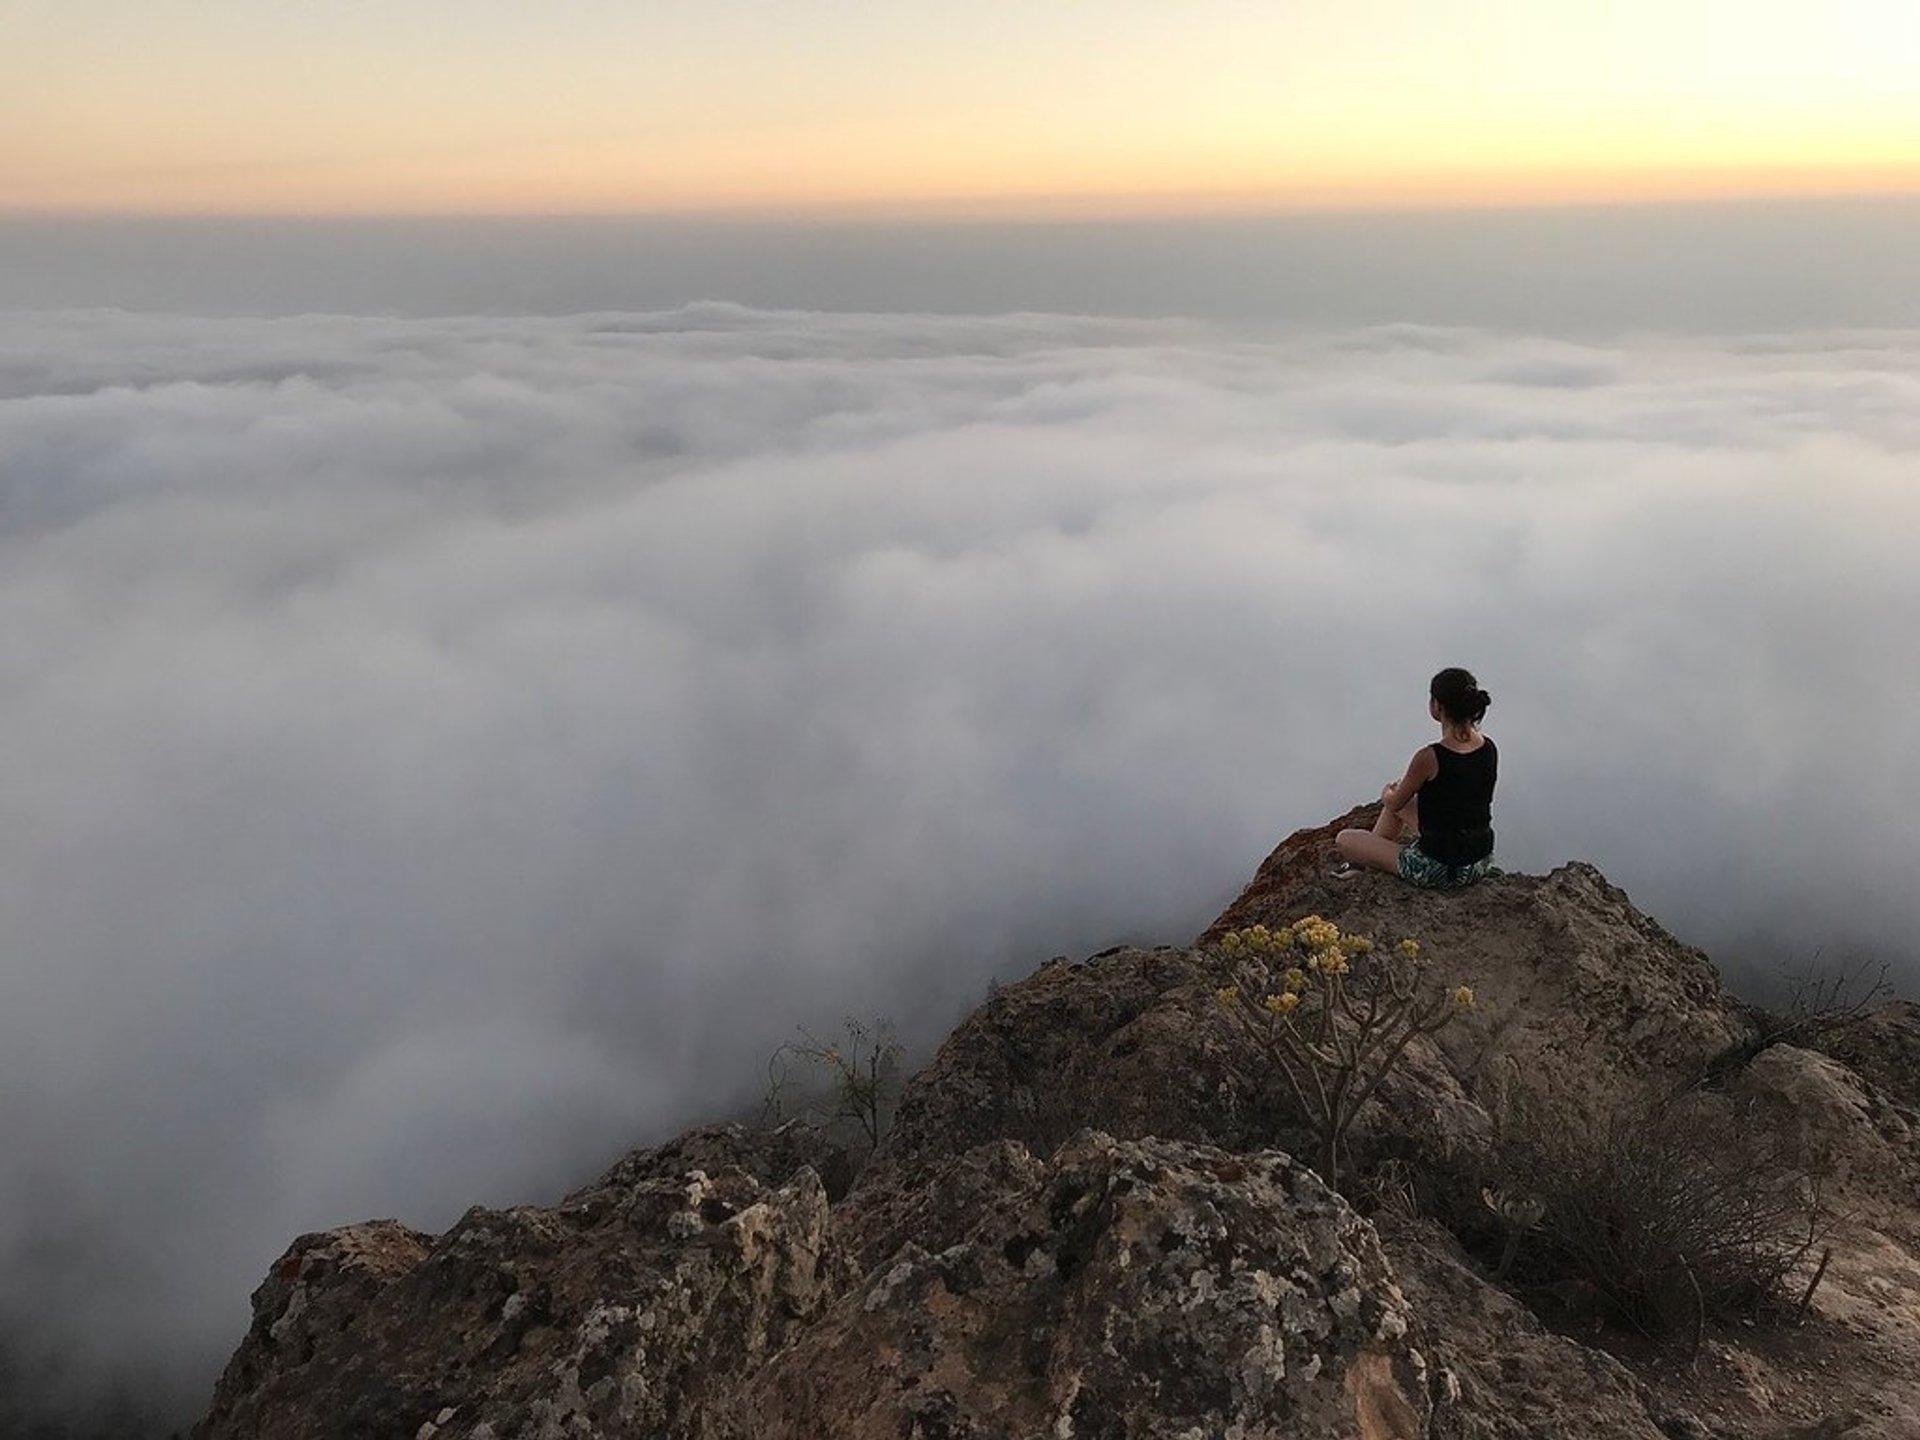 Sea of Clouds in Canary Islands - Best Season 2020